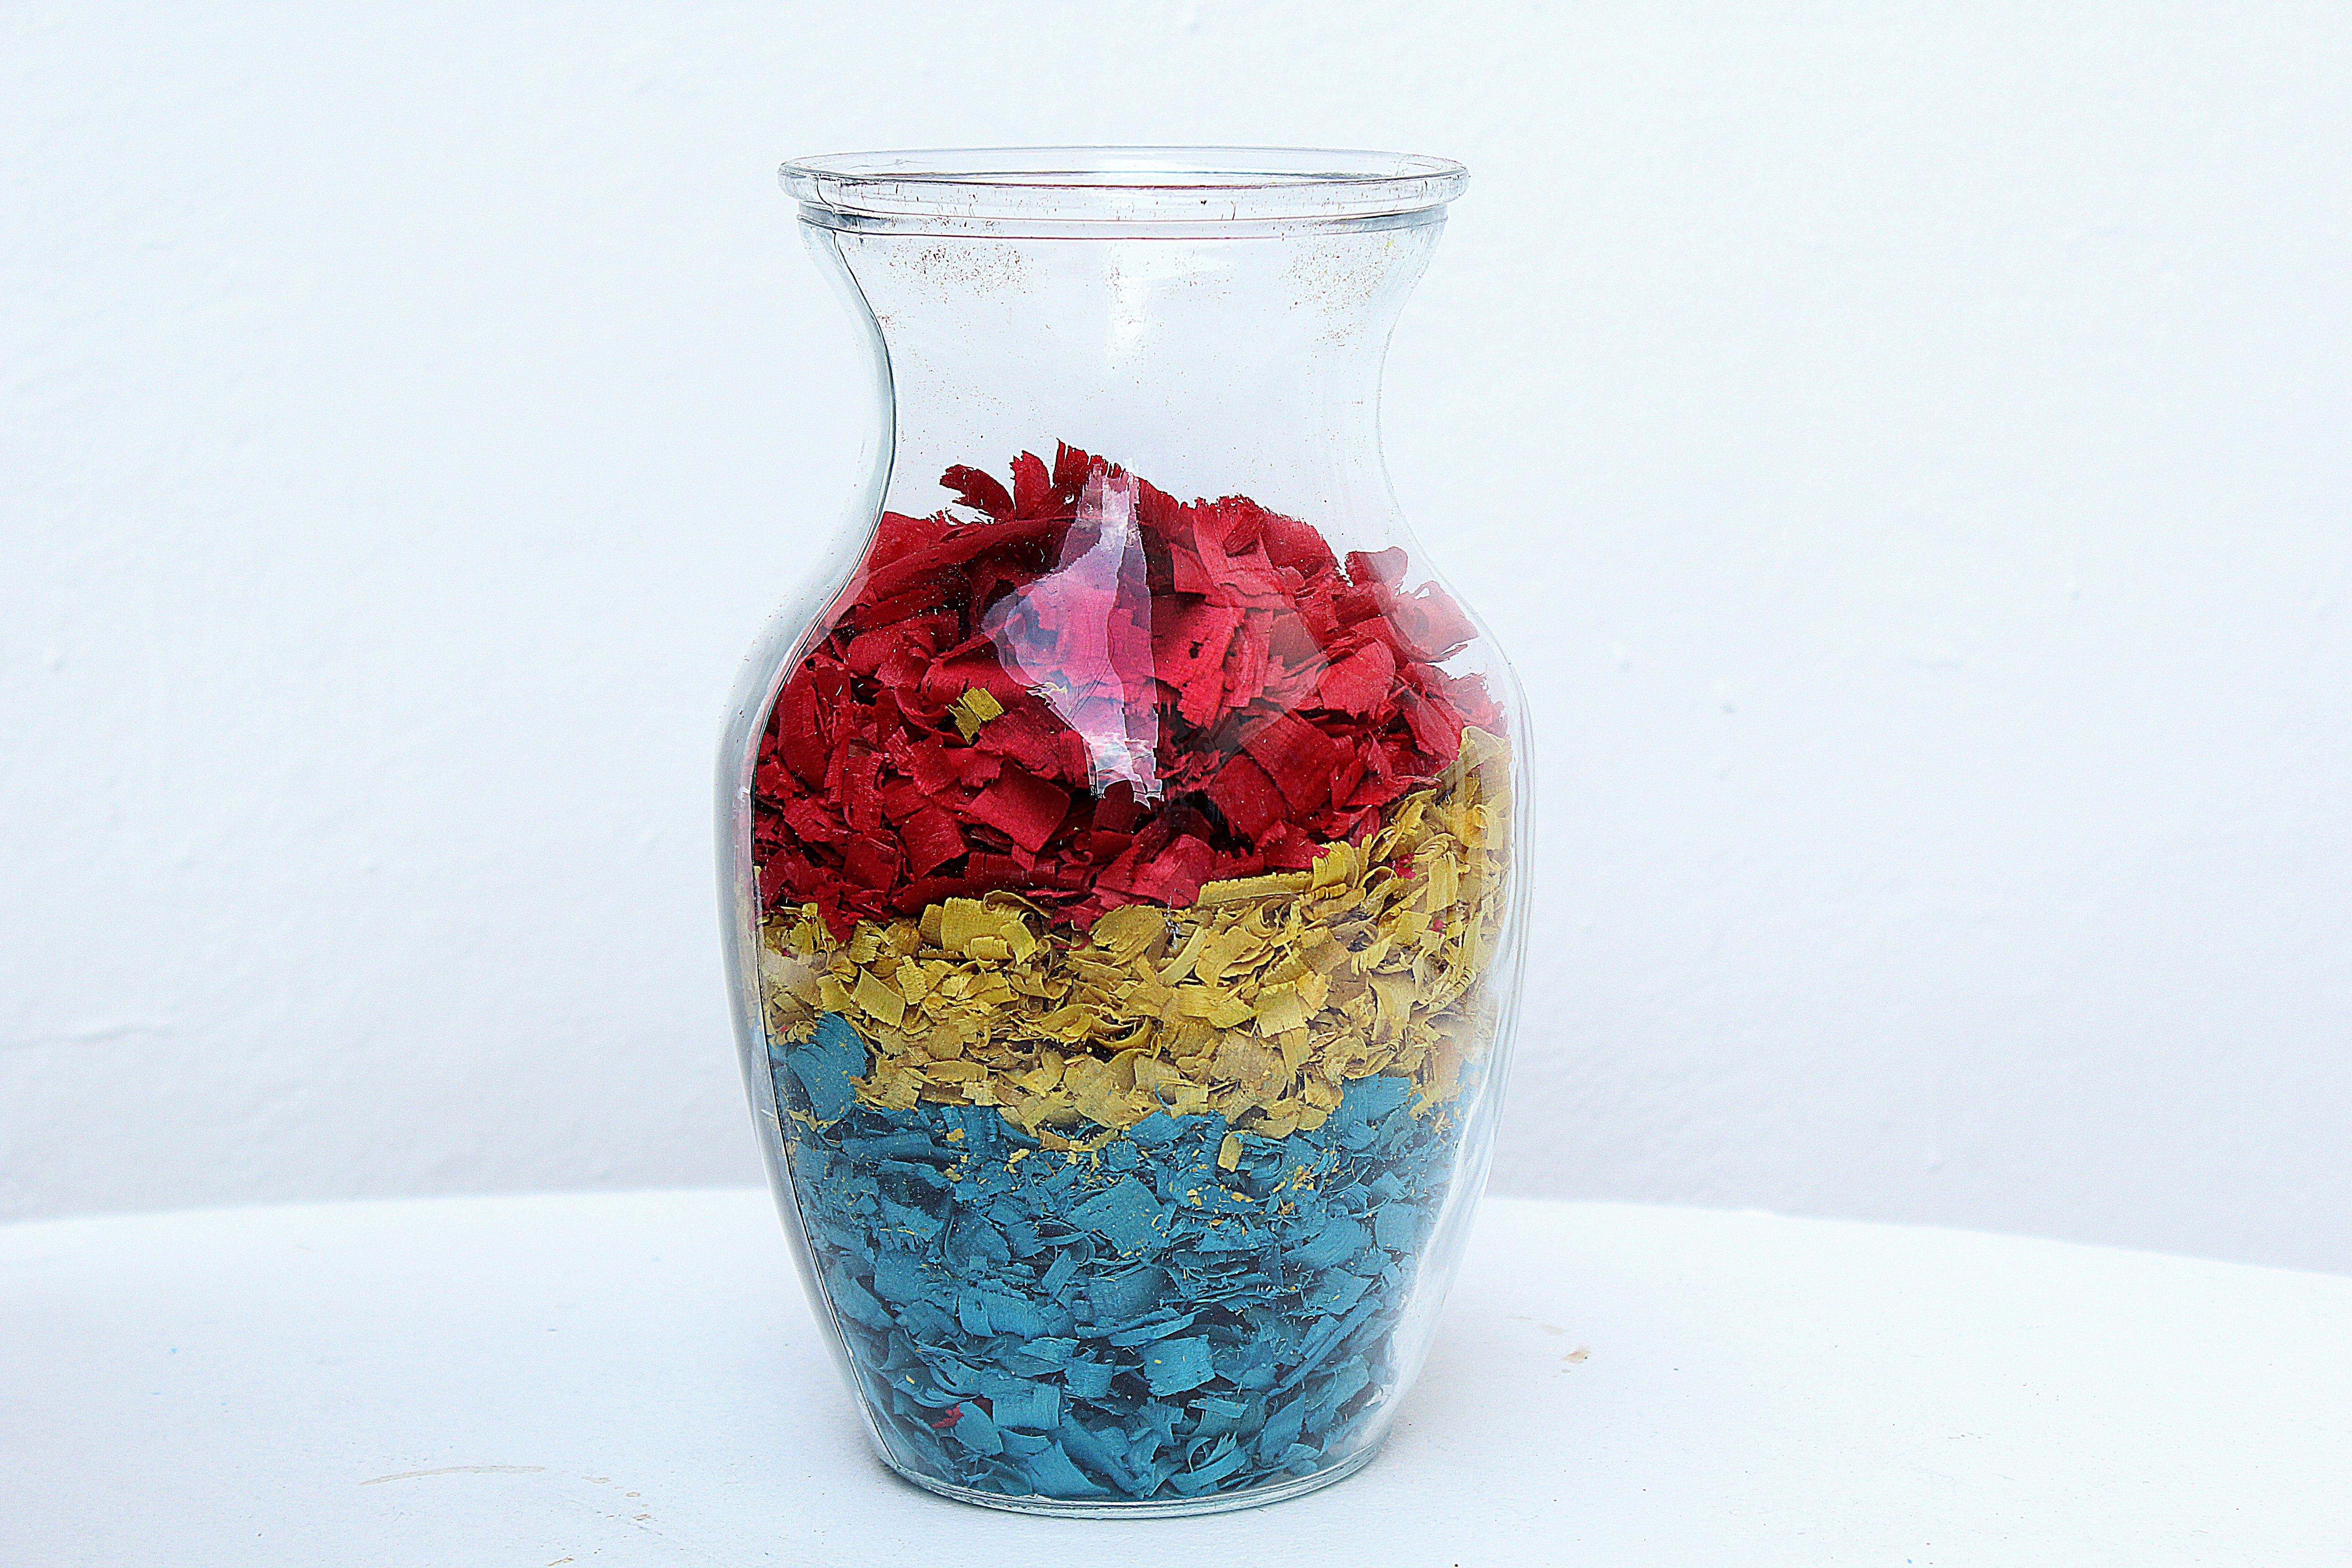 tiffany vases vintage of 37 fenton blue glass vase the weekly world regarding coloring colored glass vases elegant living room vase glass fresh